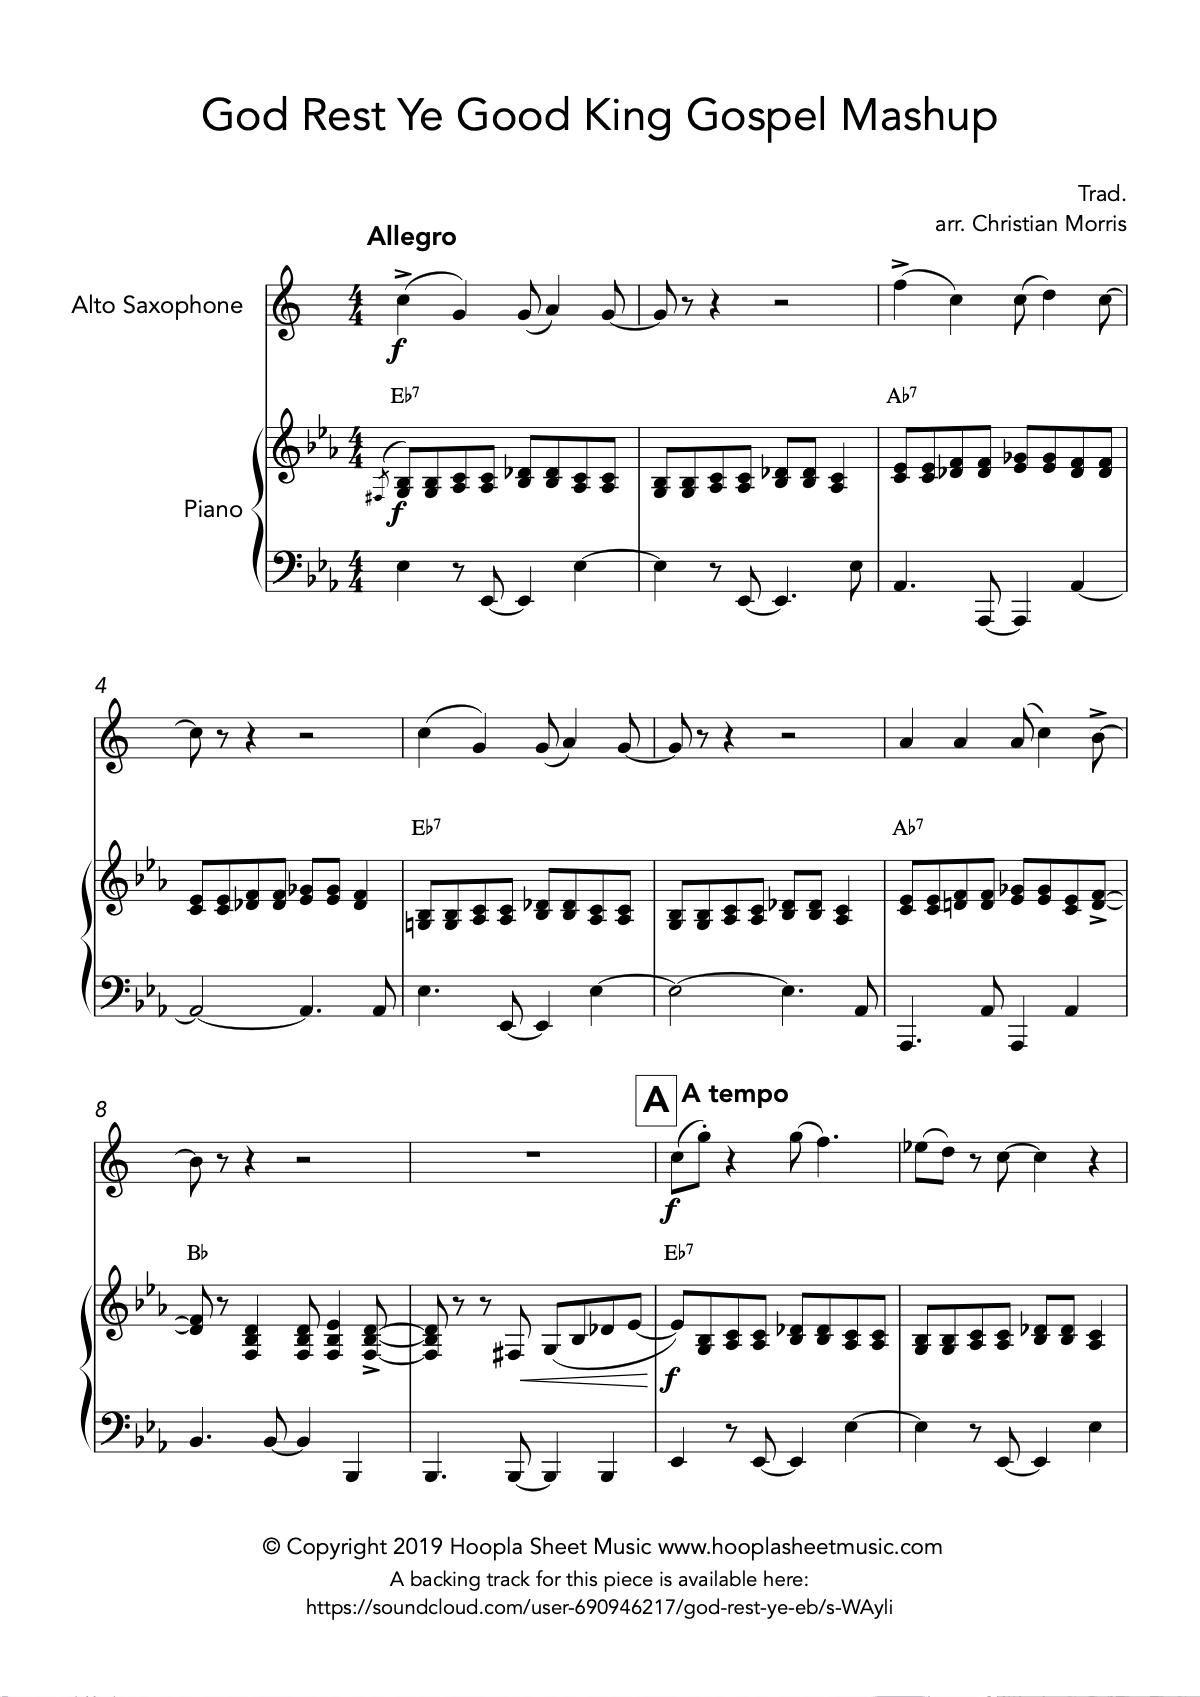 God Rest Ye Good King Gospel Mashup (Alto Saxophone)